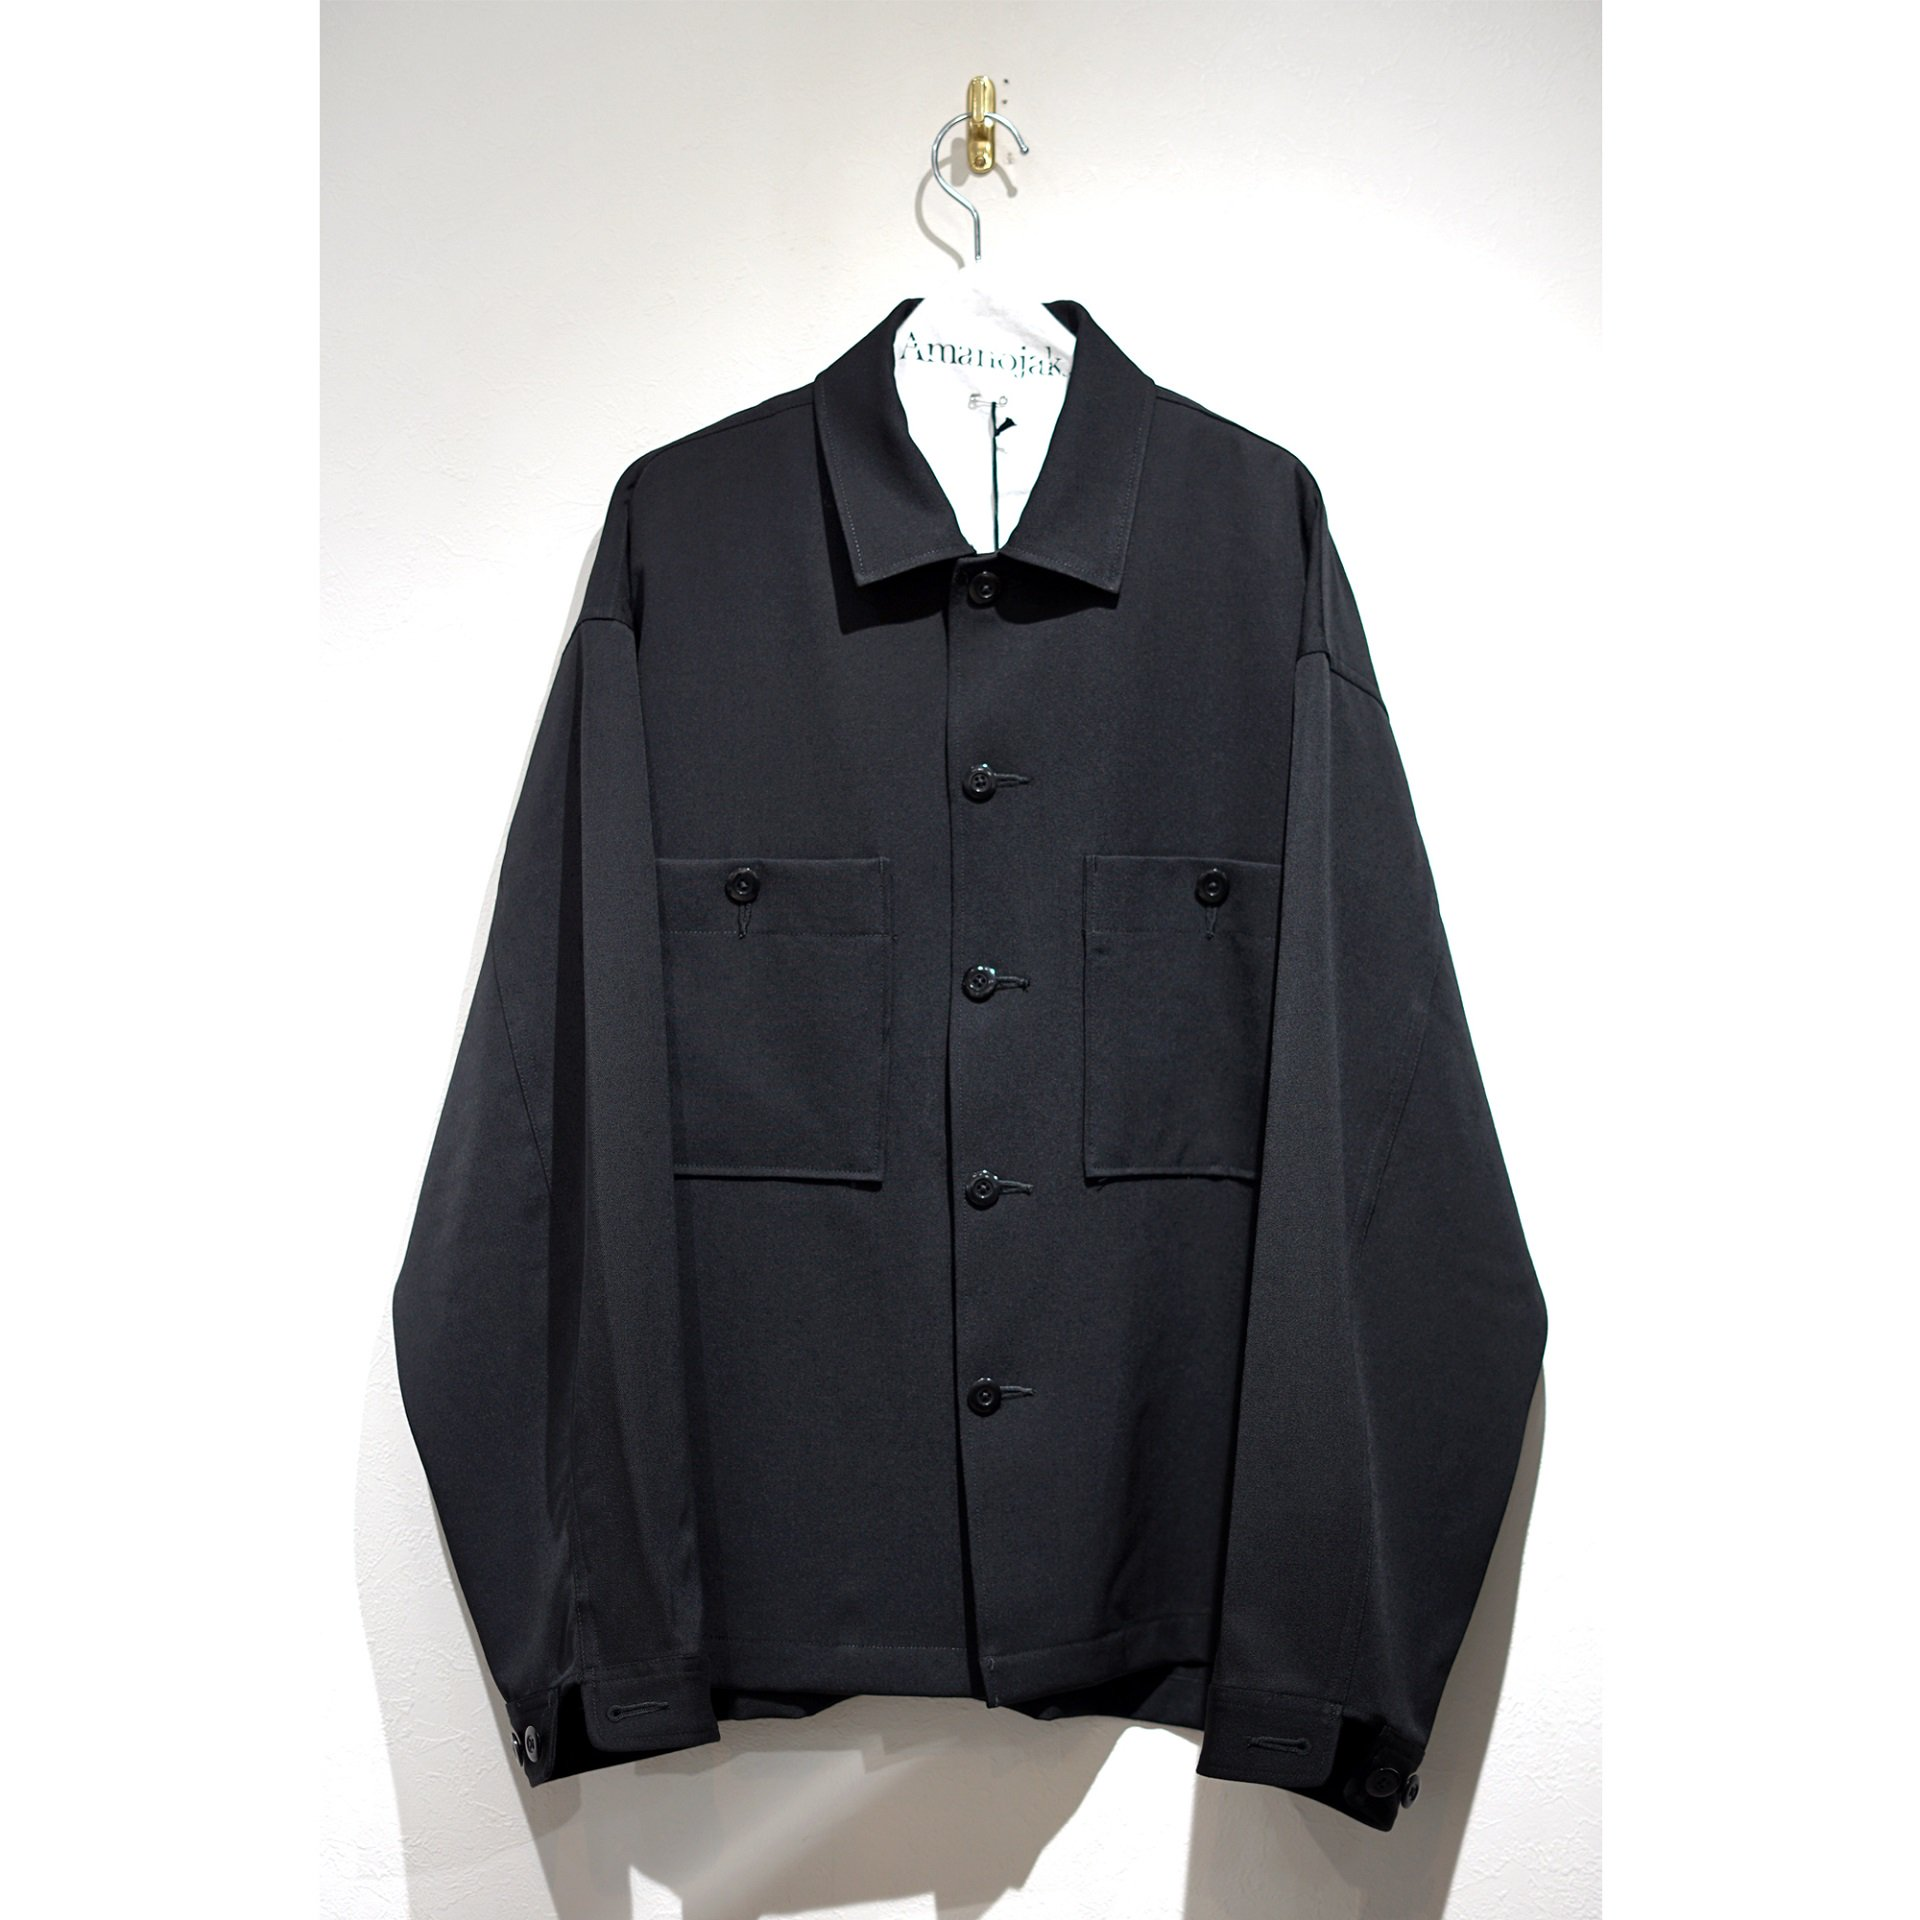 08sircus-GABARDINE STRECH SHIRT BLACK